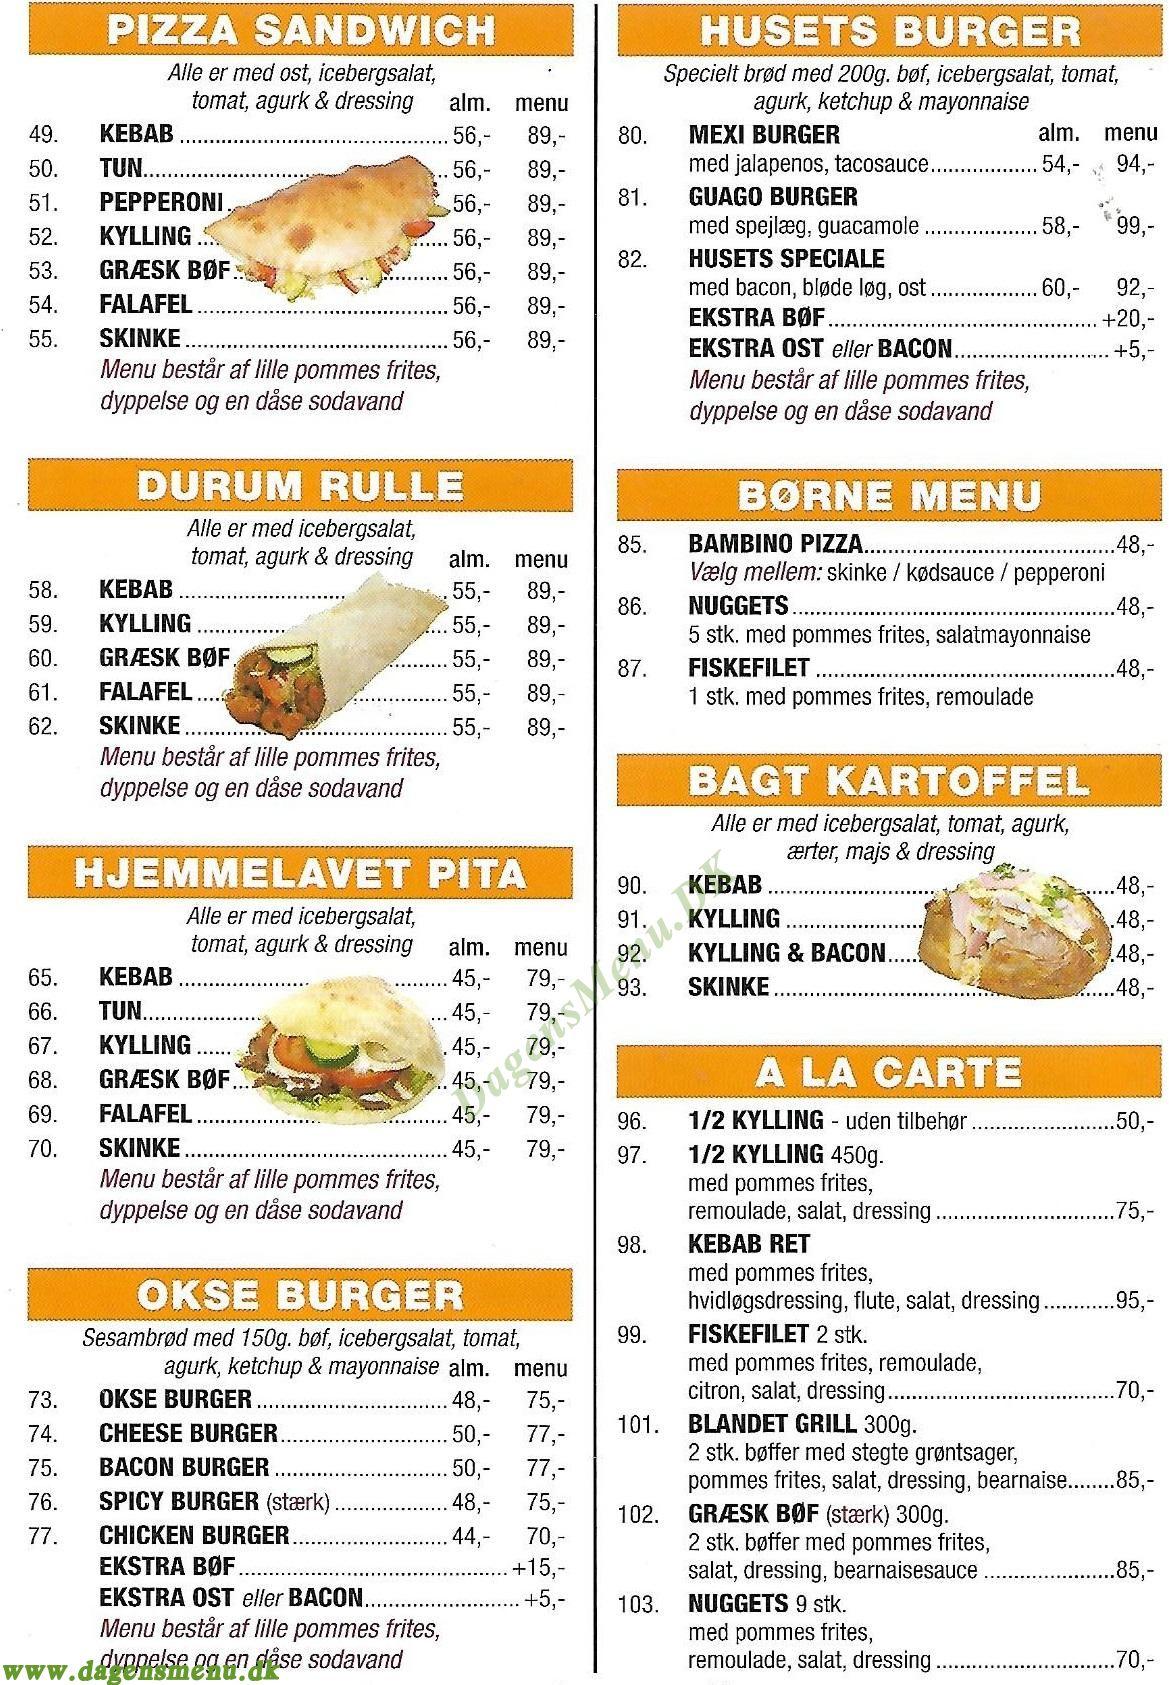 Napoli Pizza & Burger House - Menukort